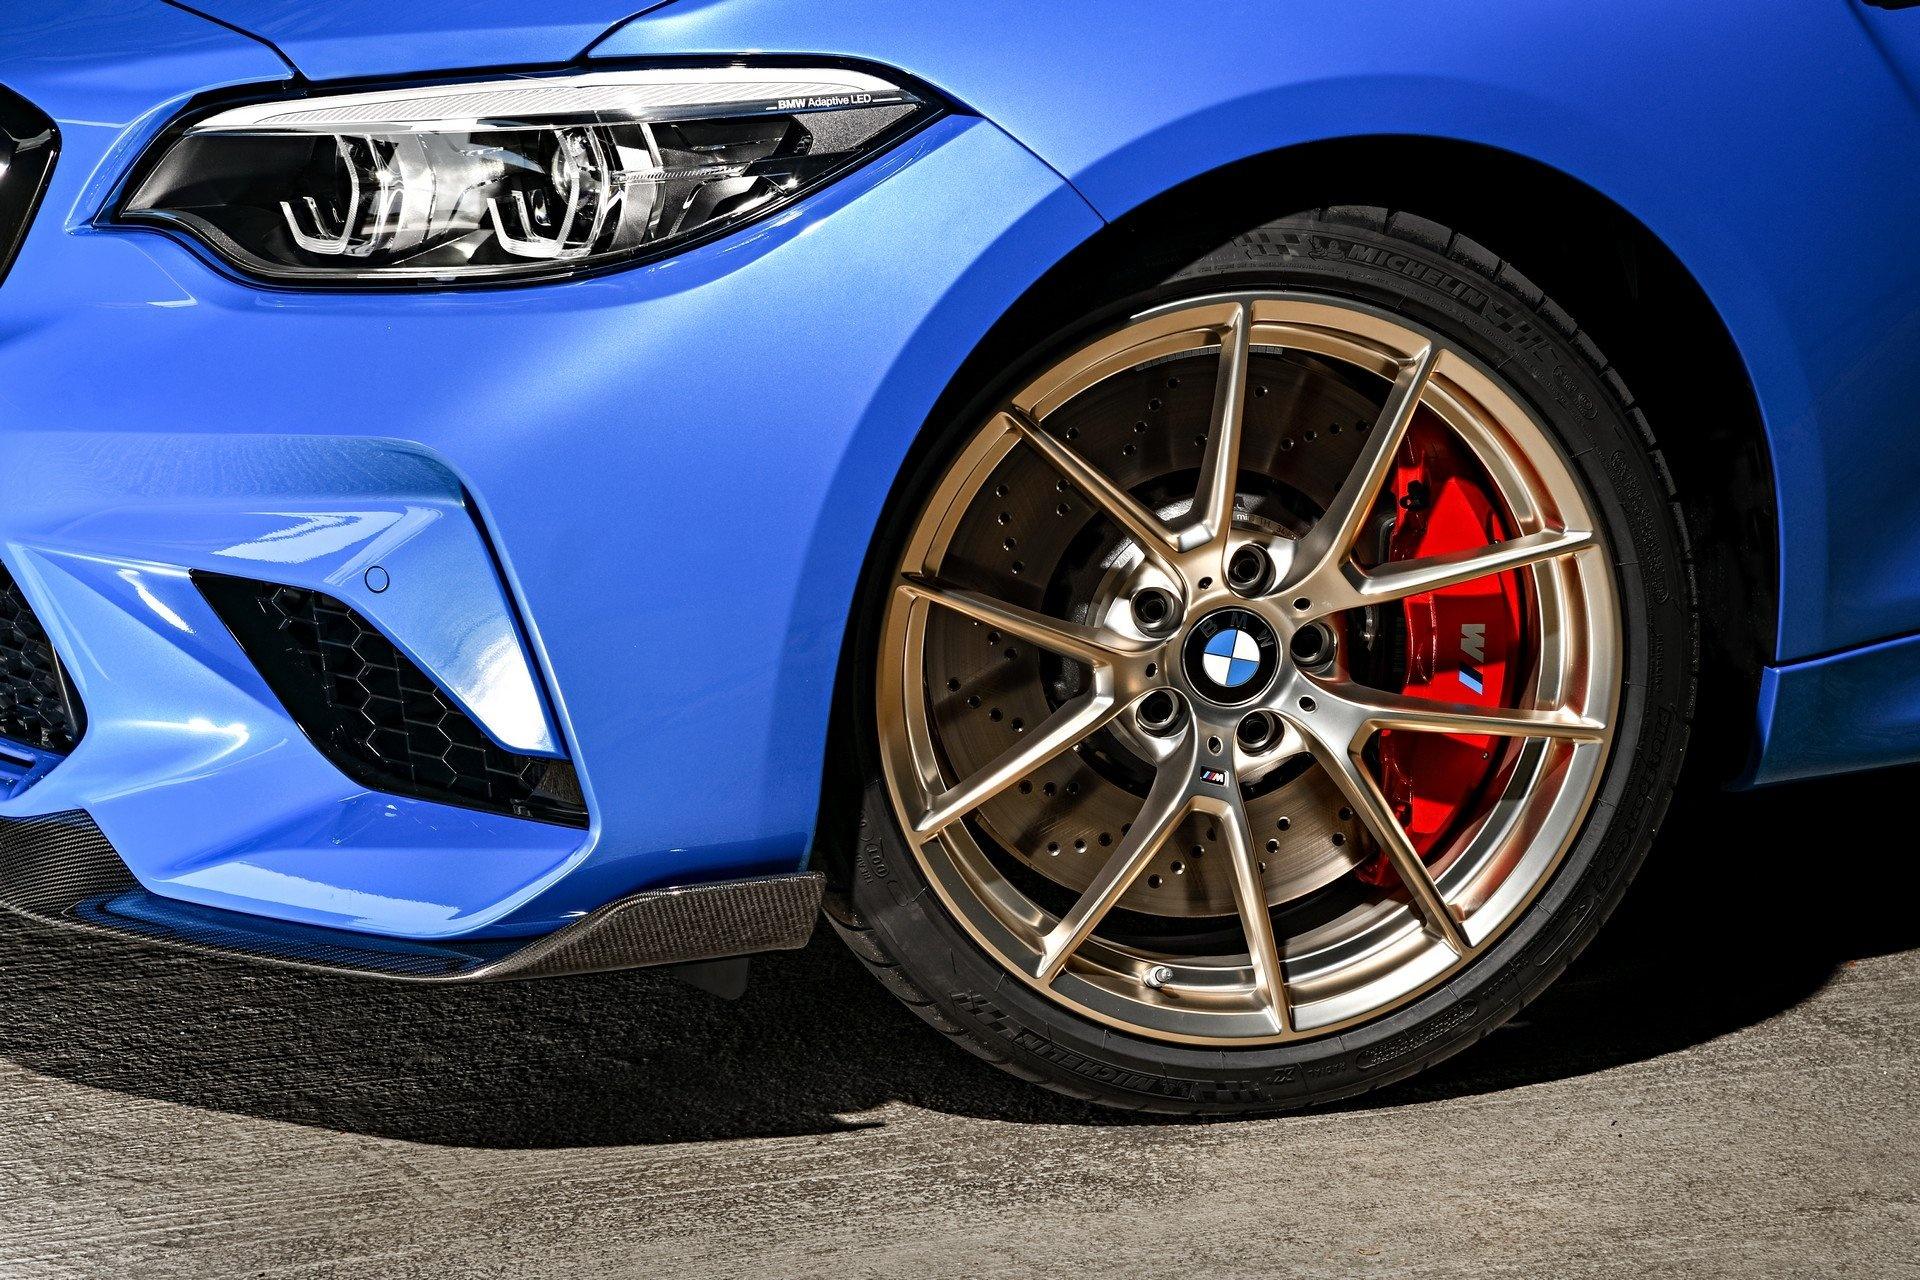 Chiem nguong BMW M2 C2 2020 anh 10